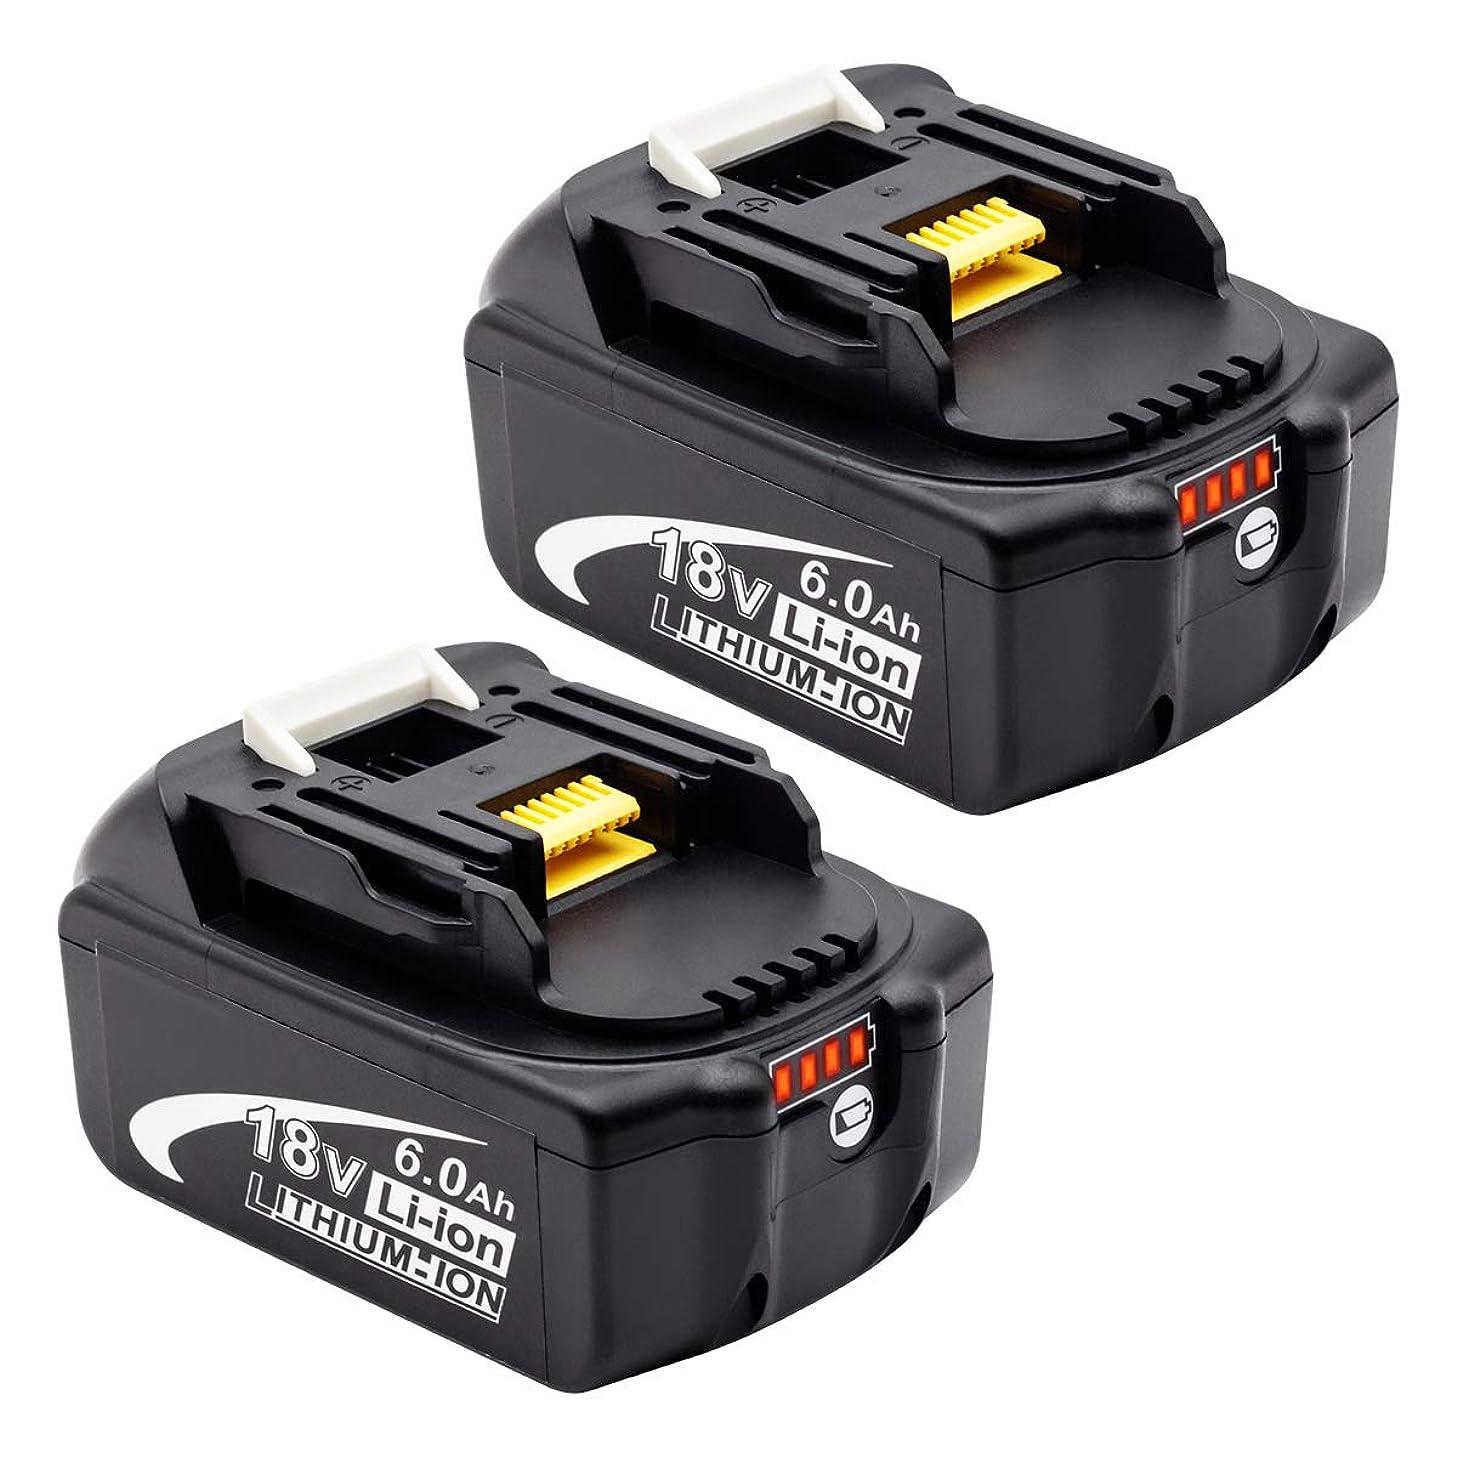 KingTianLeマキタ 18v バッテリー BL1860b マキタ18v互換バッテリー マキタバッテリー 18v BL1860 BL1830 BL1840 BL1850 BL1830b BL1840b BL1850b BL1860b 対応 PSE認証取得済み 2個セット